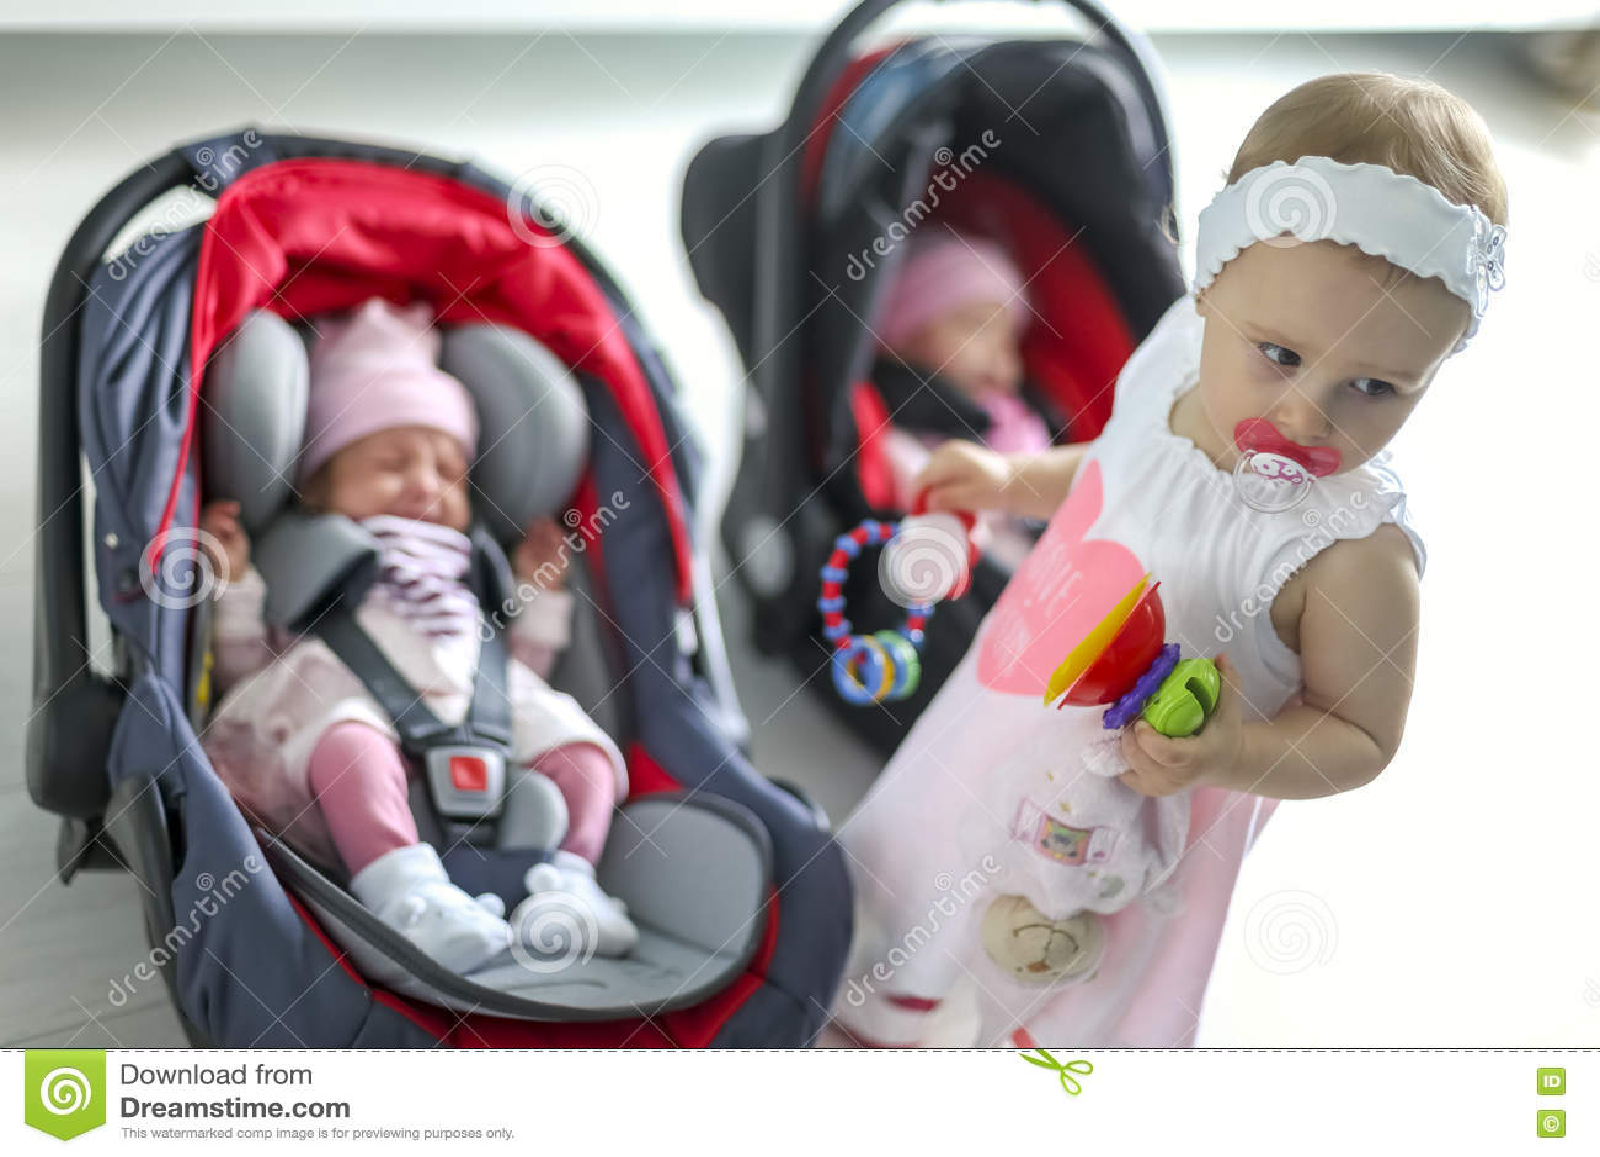 Big W Baby Car Seats